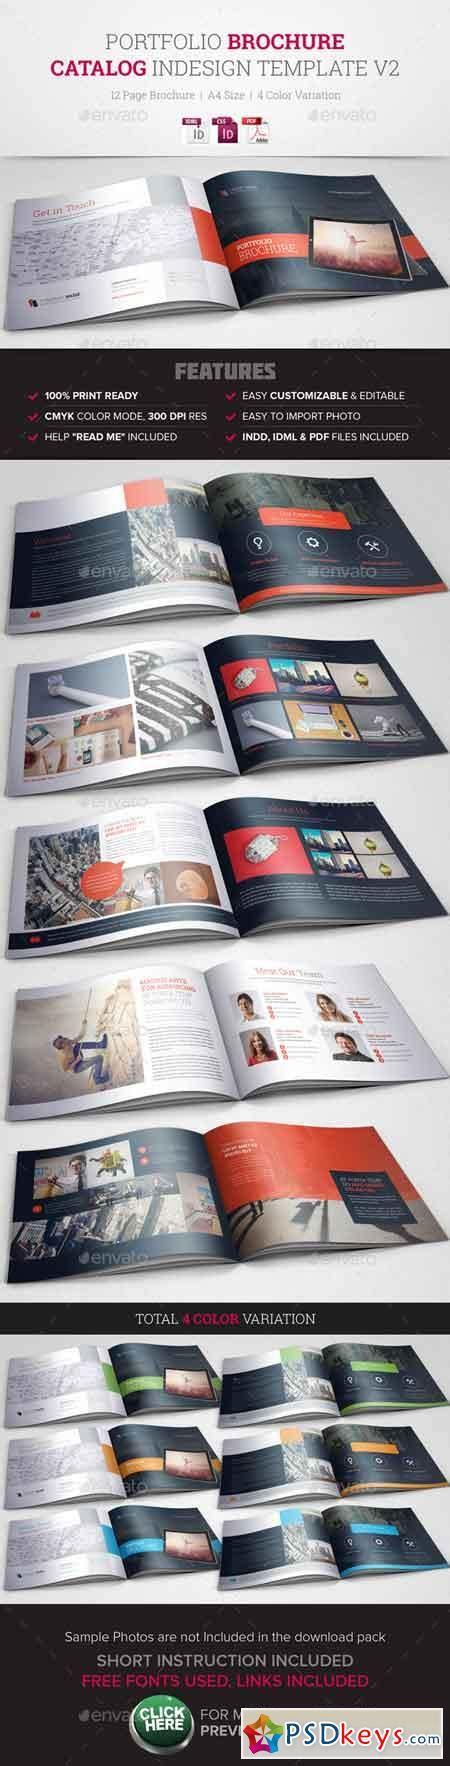 Free Indesign Portfolio Templates by Portfolio Brochure Indesign Template V2 10491396 187 Free